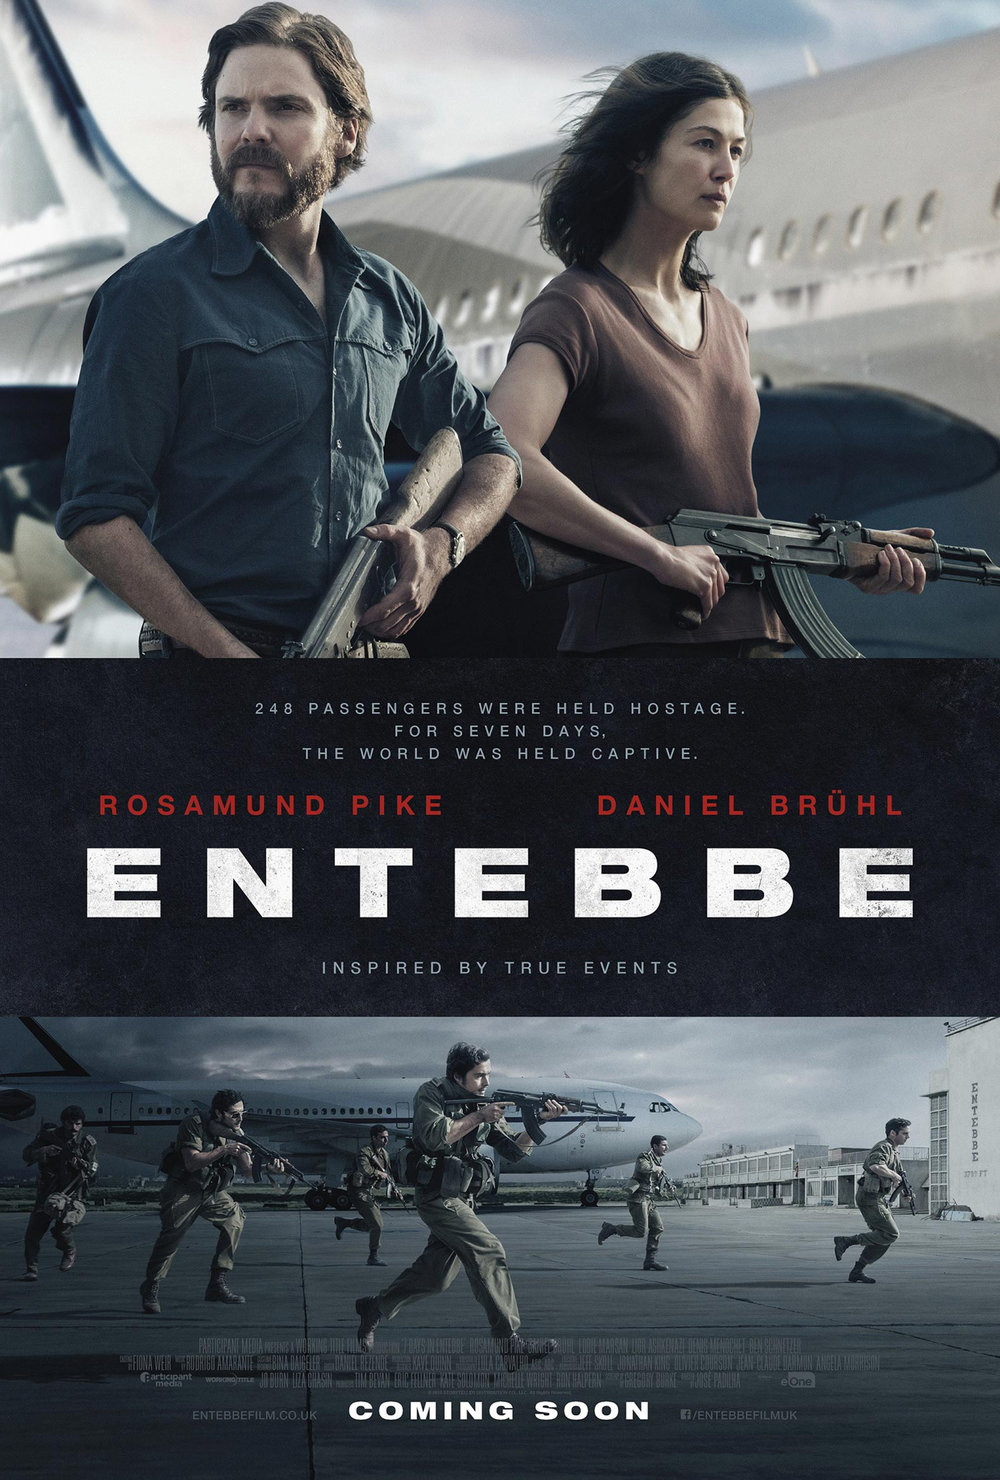 7 days in Entebbe - Film 2018 - BlueBolt Ltd.